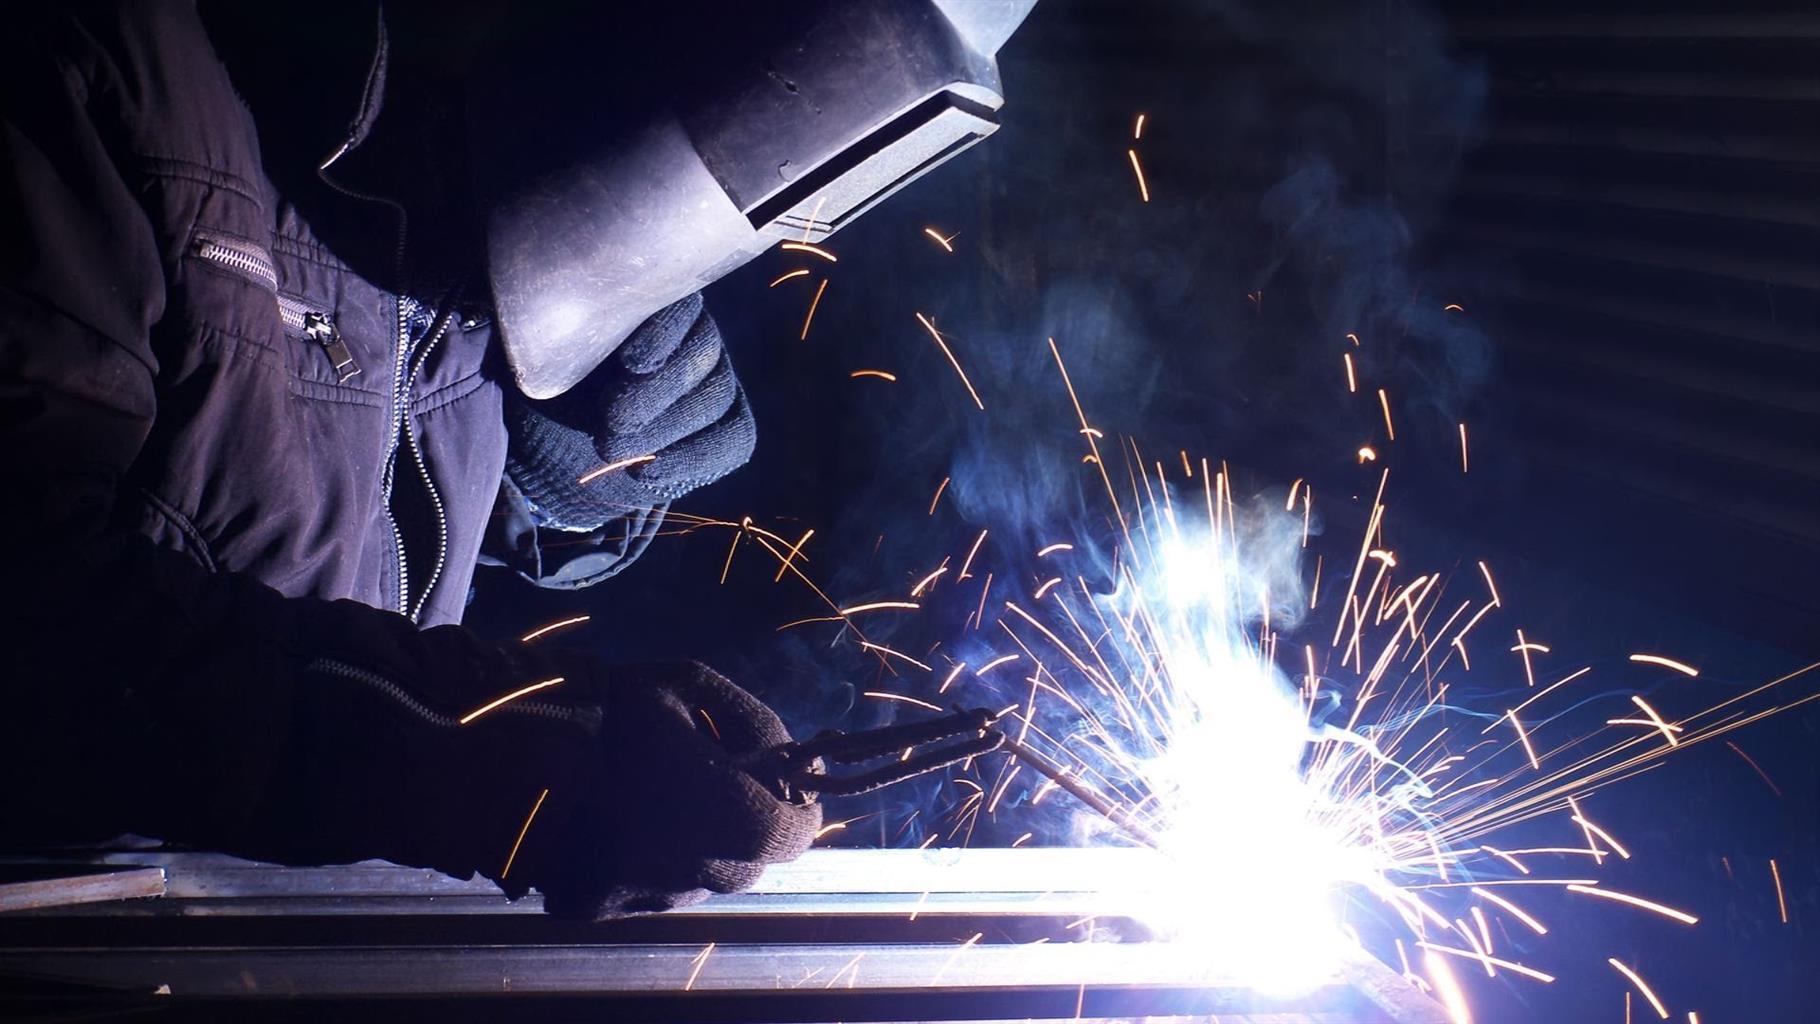 Boilermaking training.Trade test on Artisan courses. plumbing.welding. @0791658112